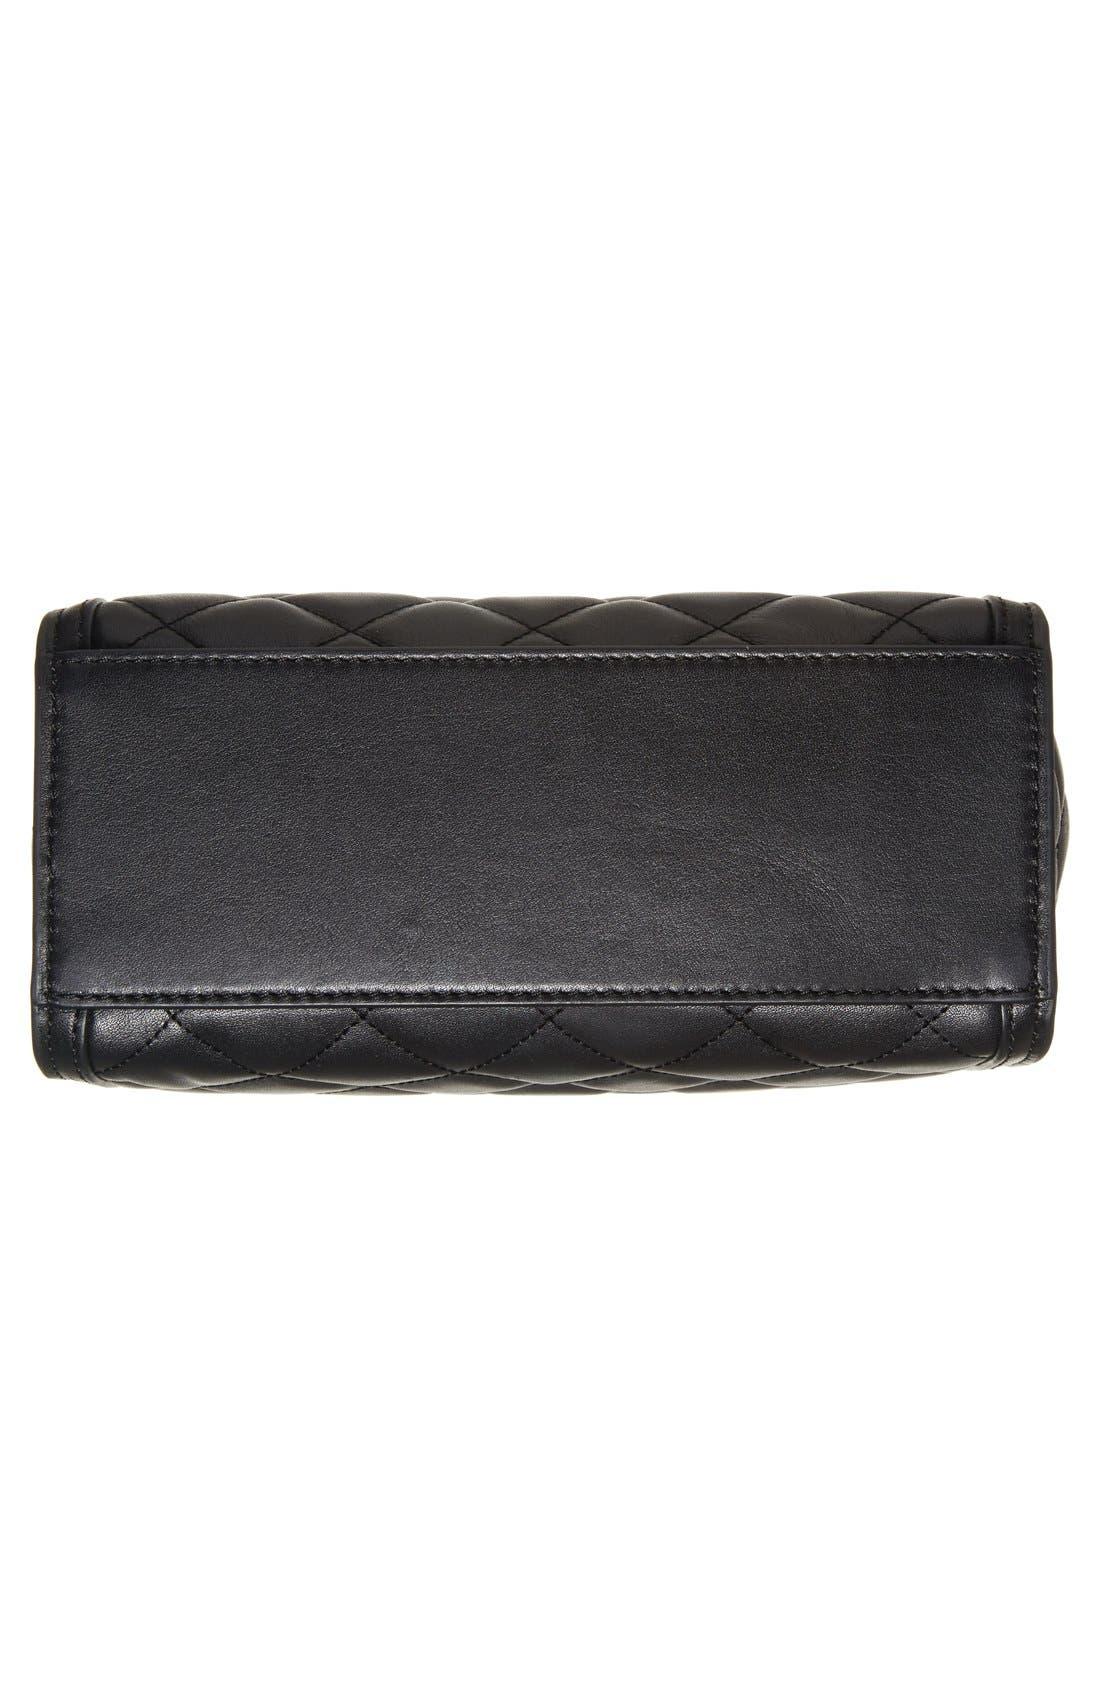 Alternate Image 4  - MICHAEL Michael Kors 'Medium Selma' Quilted Leather Messenger Bag